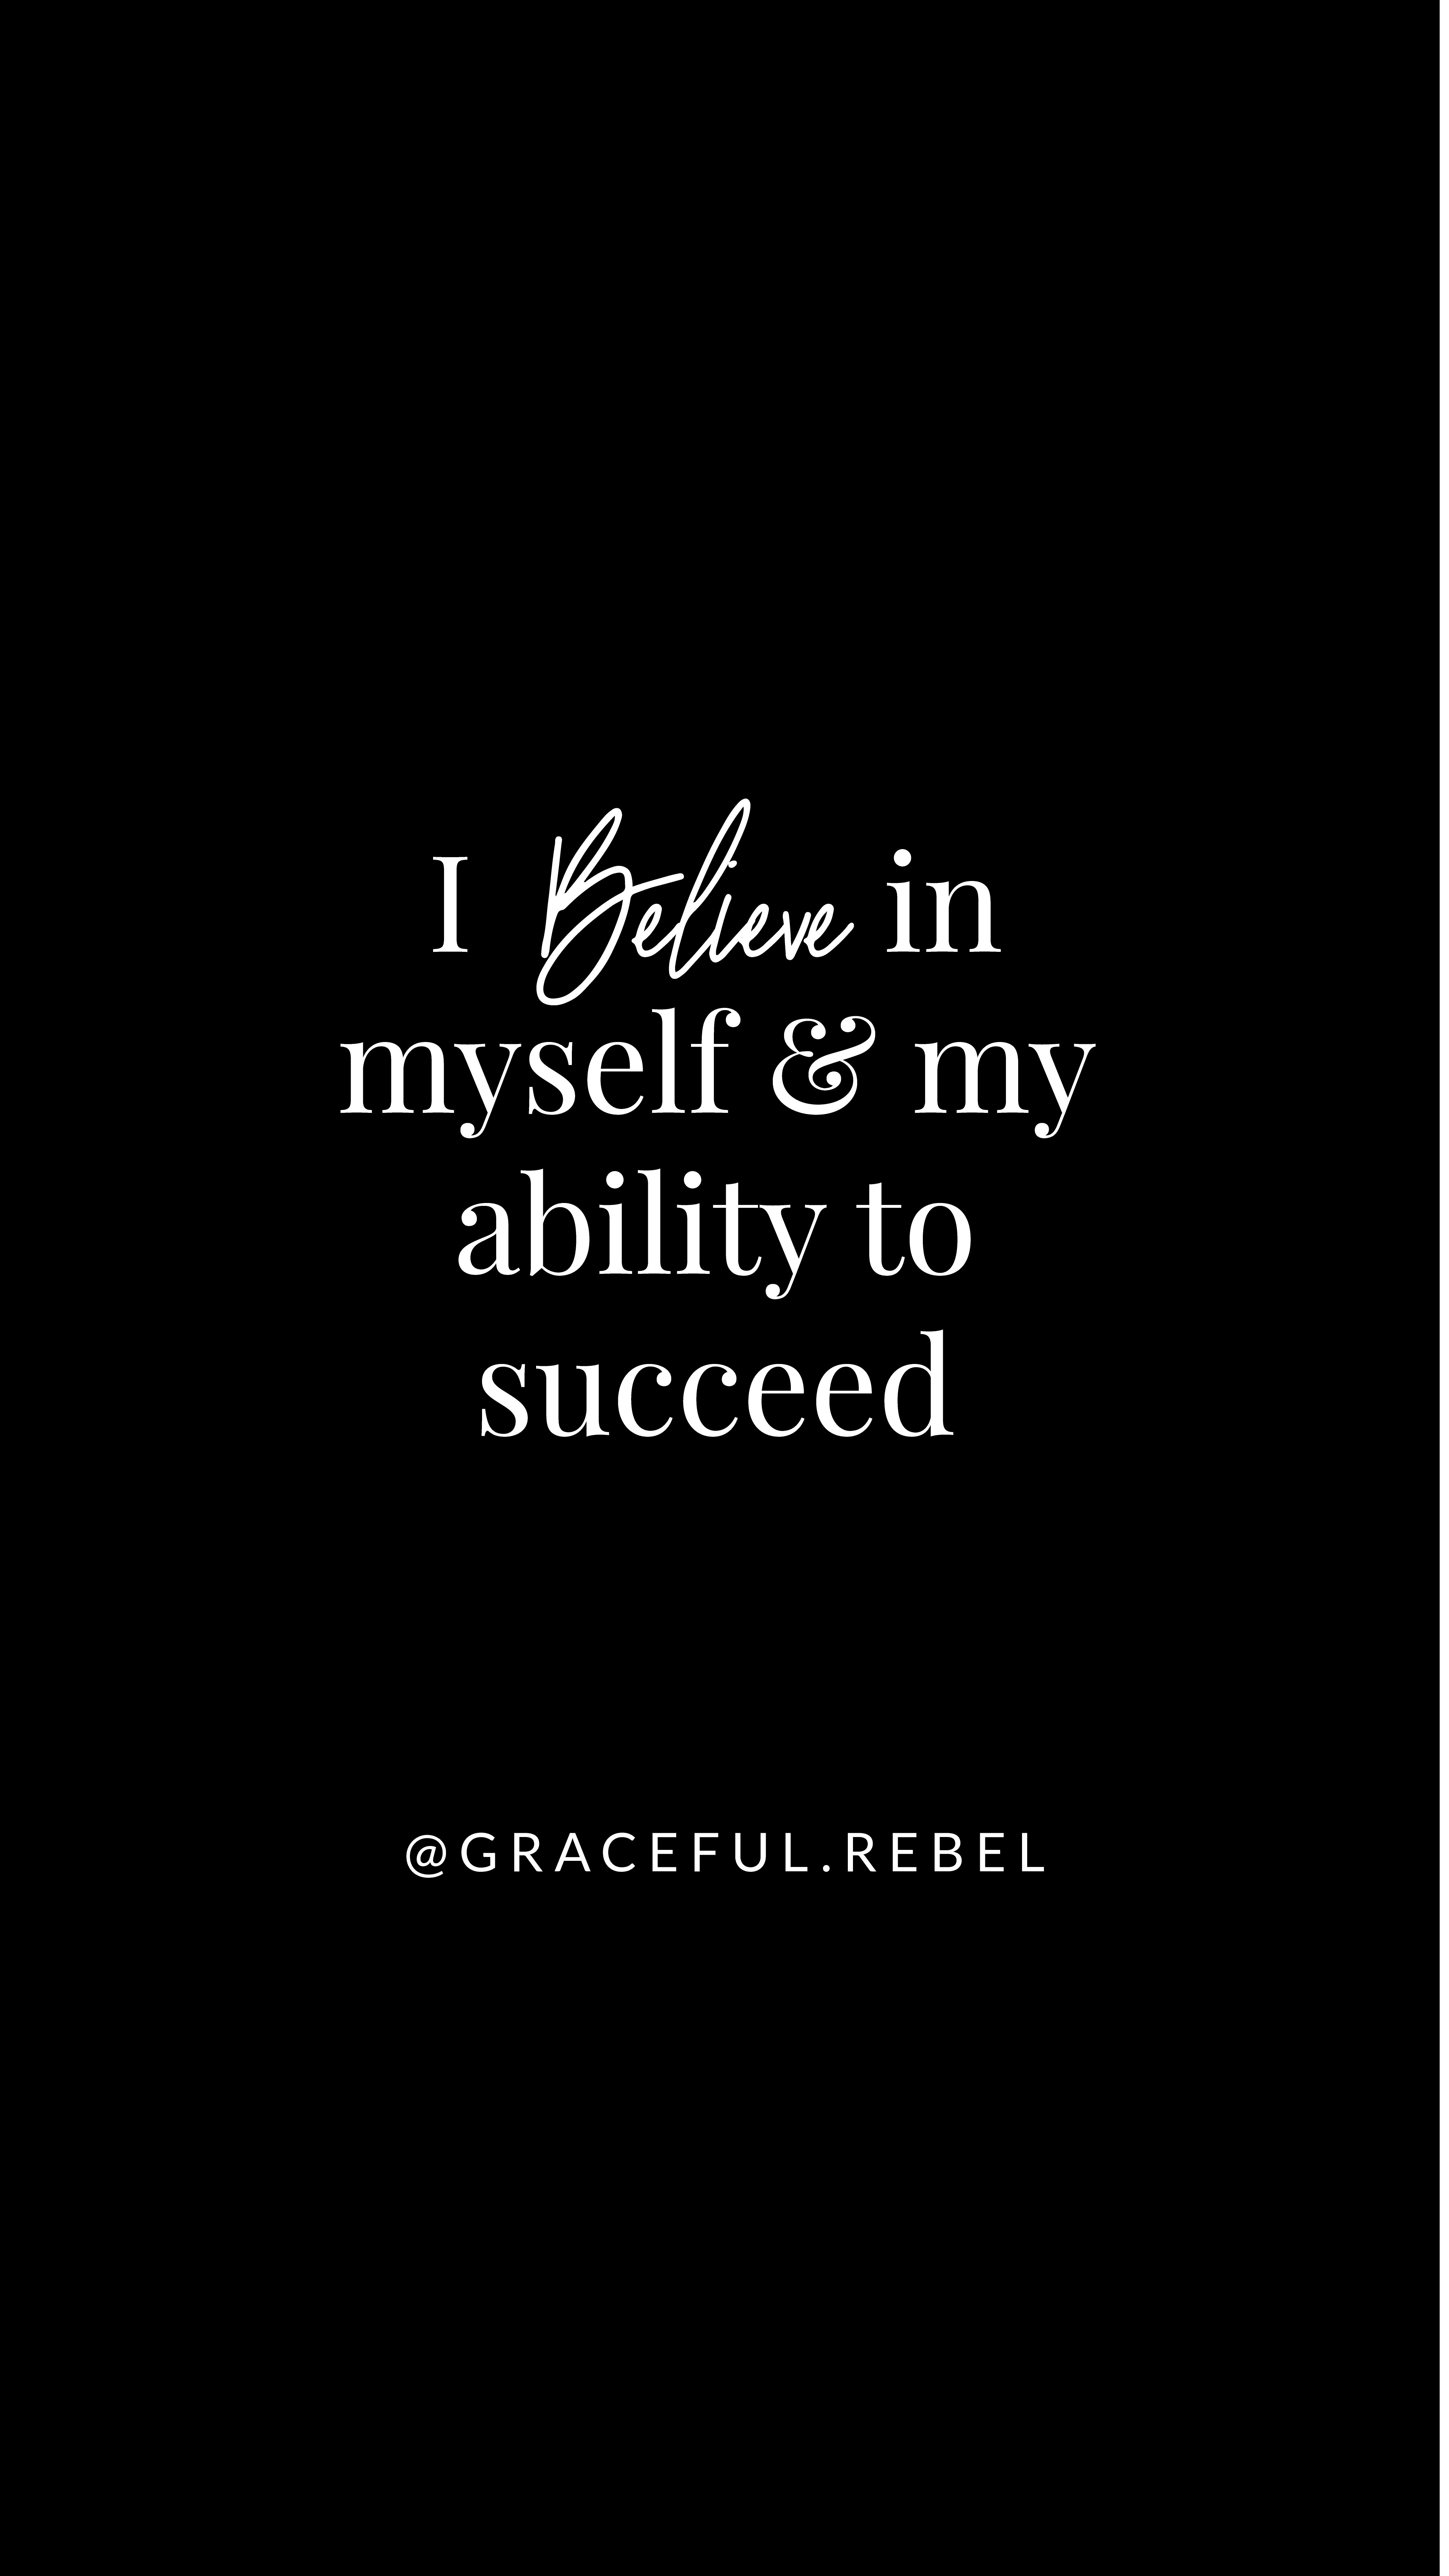 I Believe In Myself Gracefulrebel Com Affirmation Affirmation Quotes Manifestation Quotes Self Love Quotes